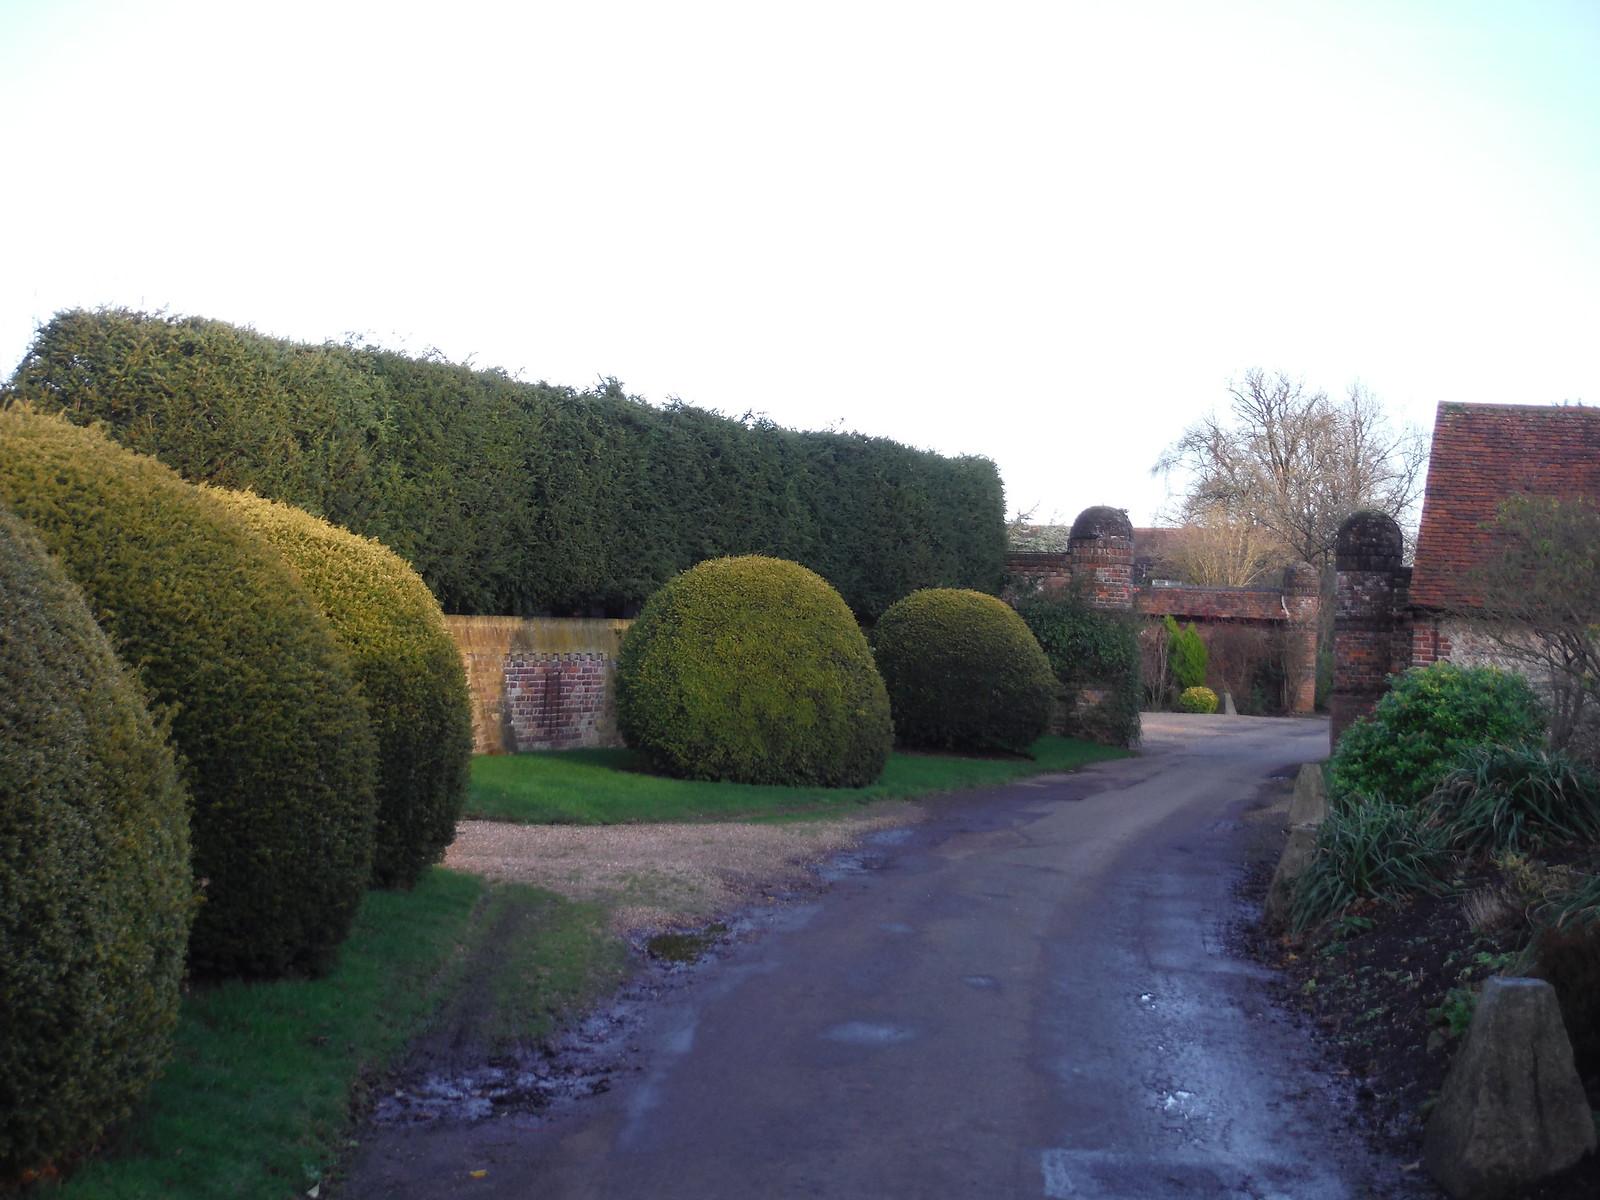 Little Pednor Farm SWC Walk 140a Wendover to Great Missenden